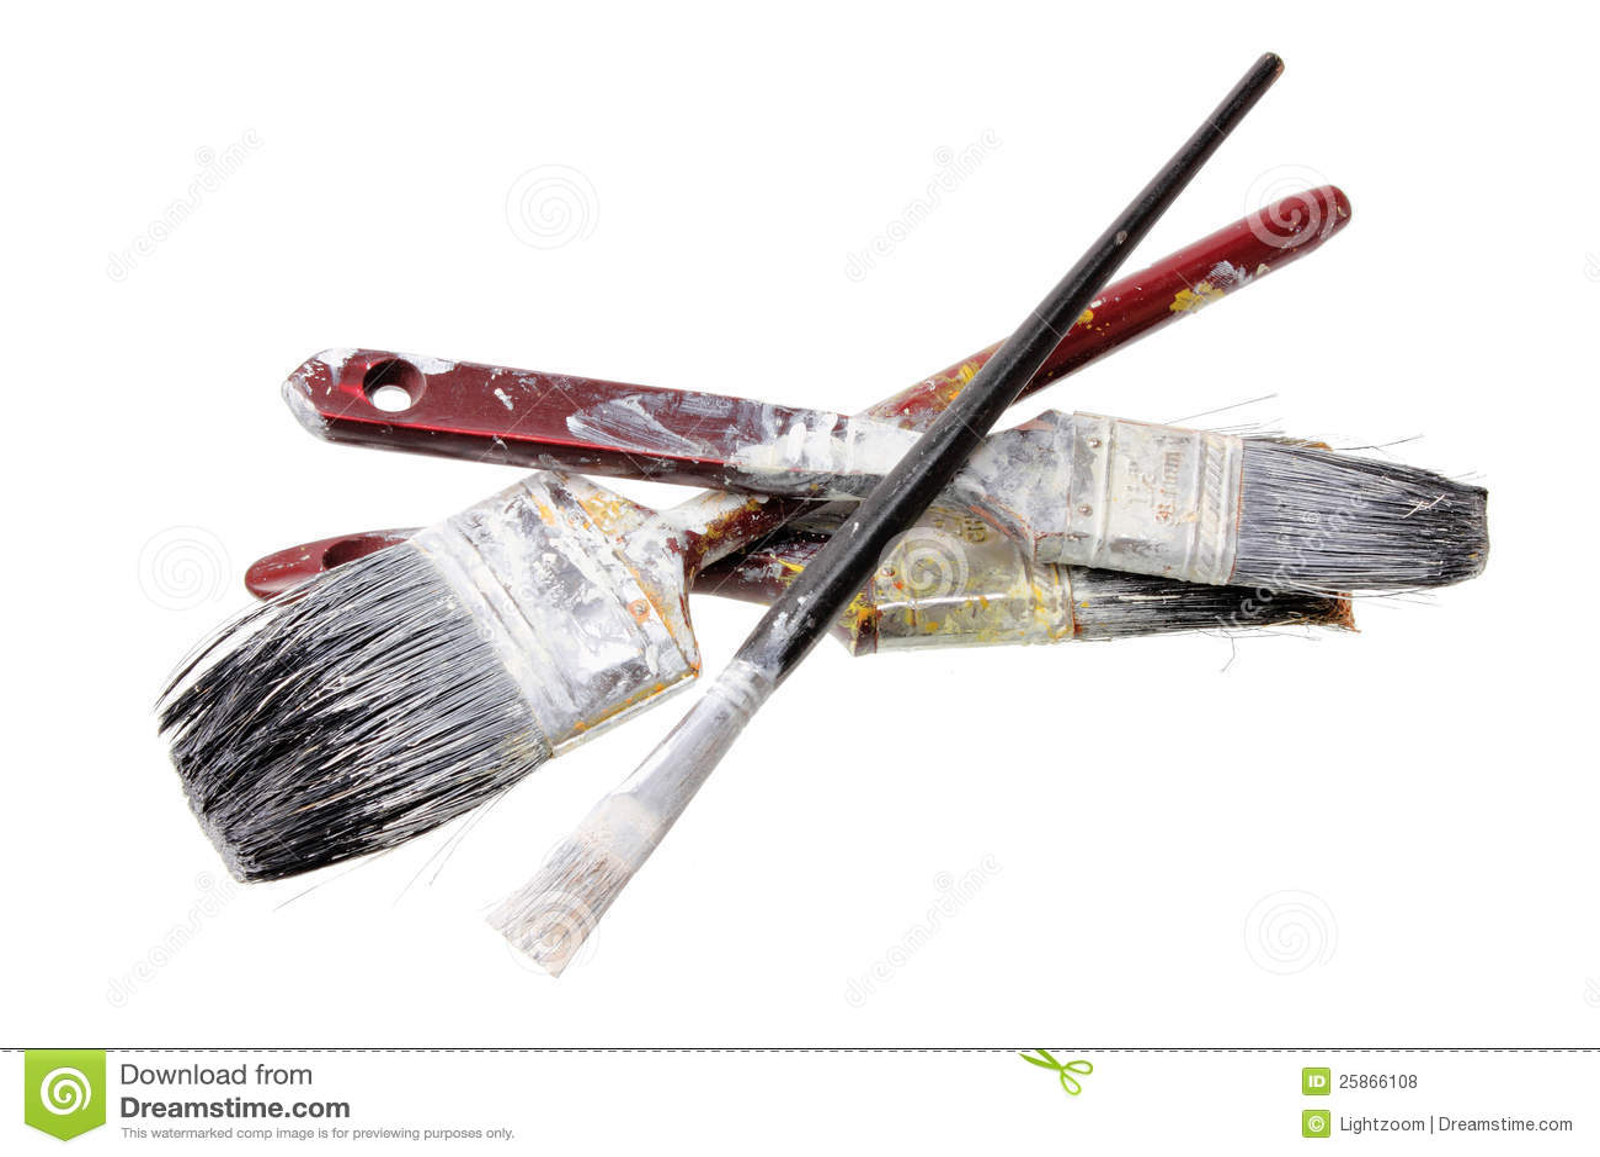 Old Paint Brushes Royalty Free Stock Photos - Image: 25866108: dreamstime.com/royalty-free-stock-photos-old-paint-brushes...